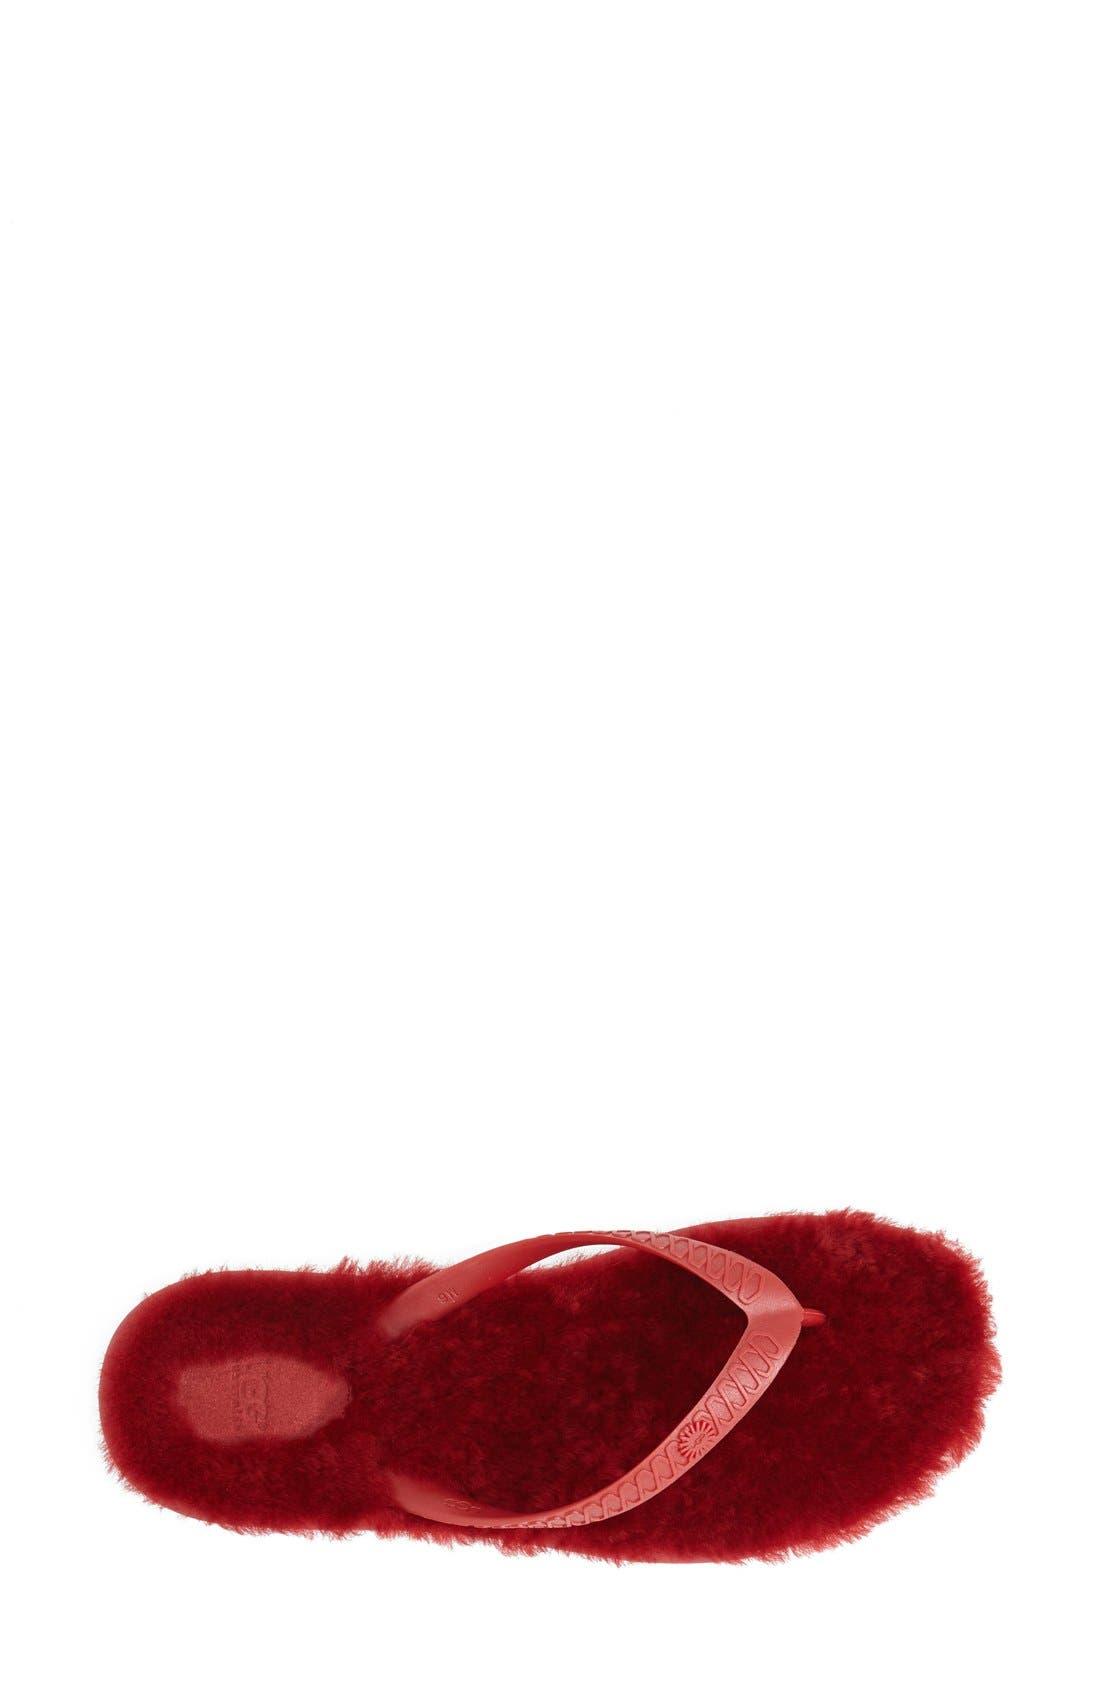 Alternate Image 3  - UGG® 'Fluffie' Flip Flop (Women)